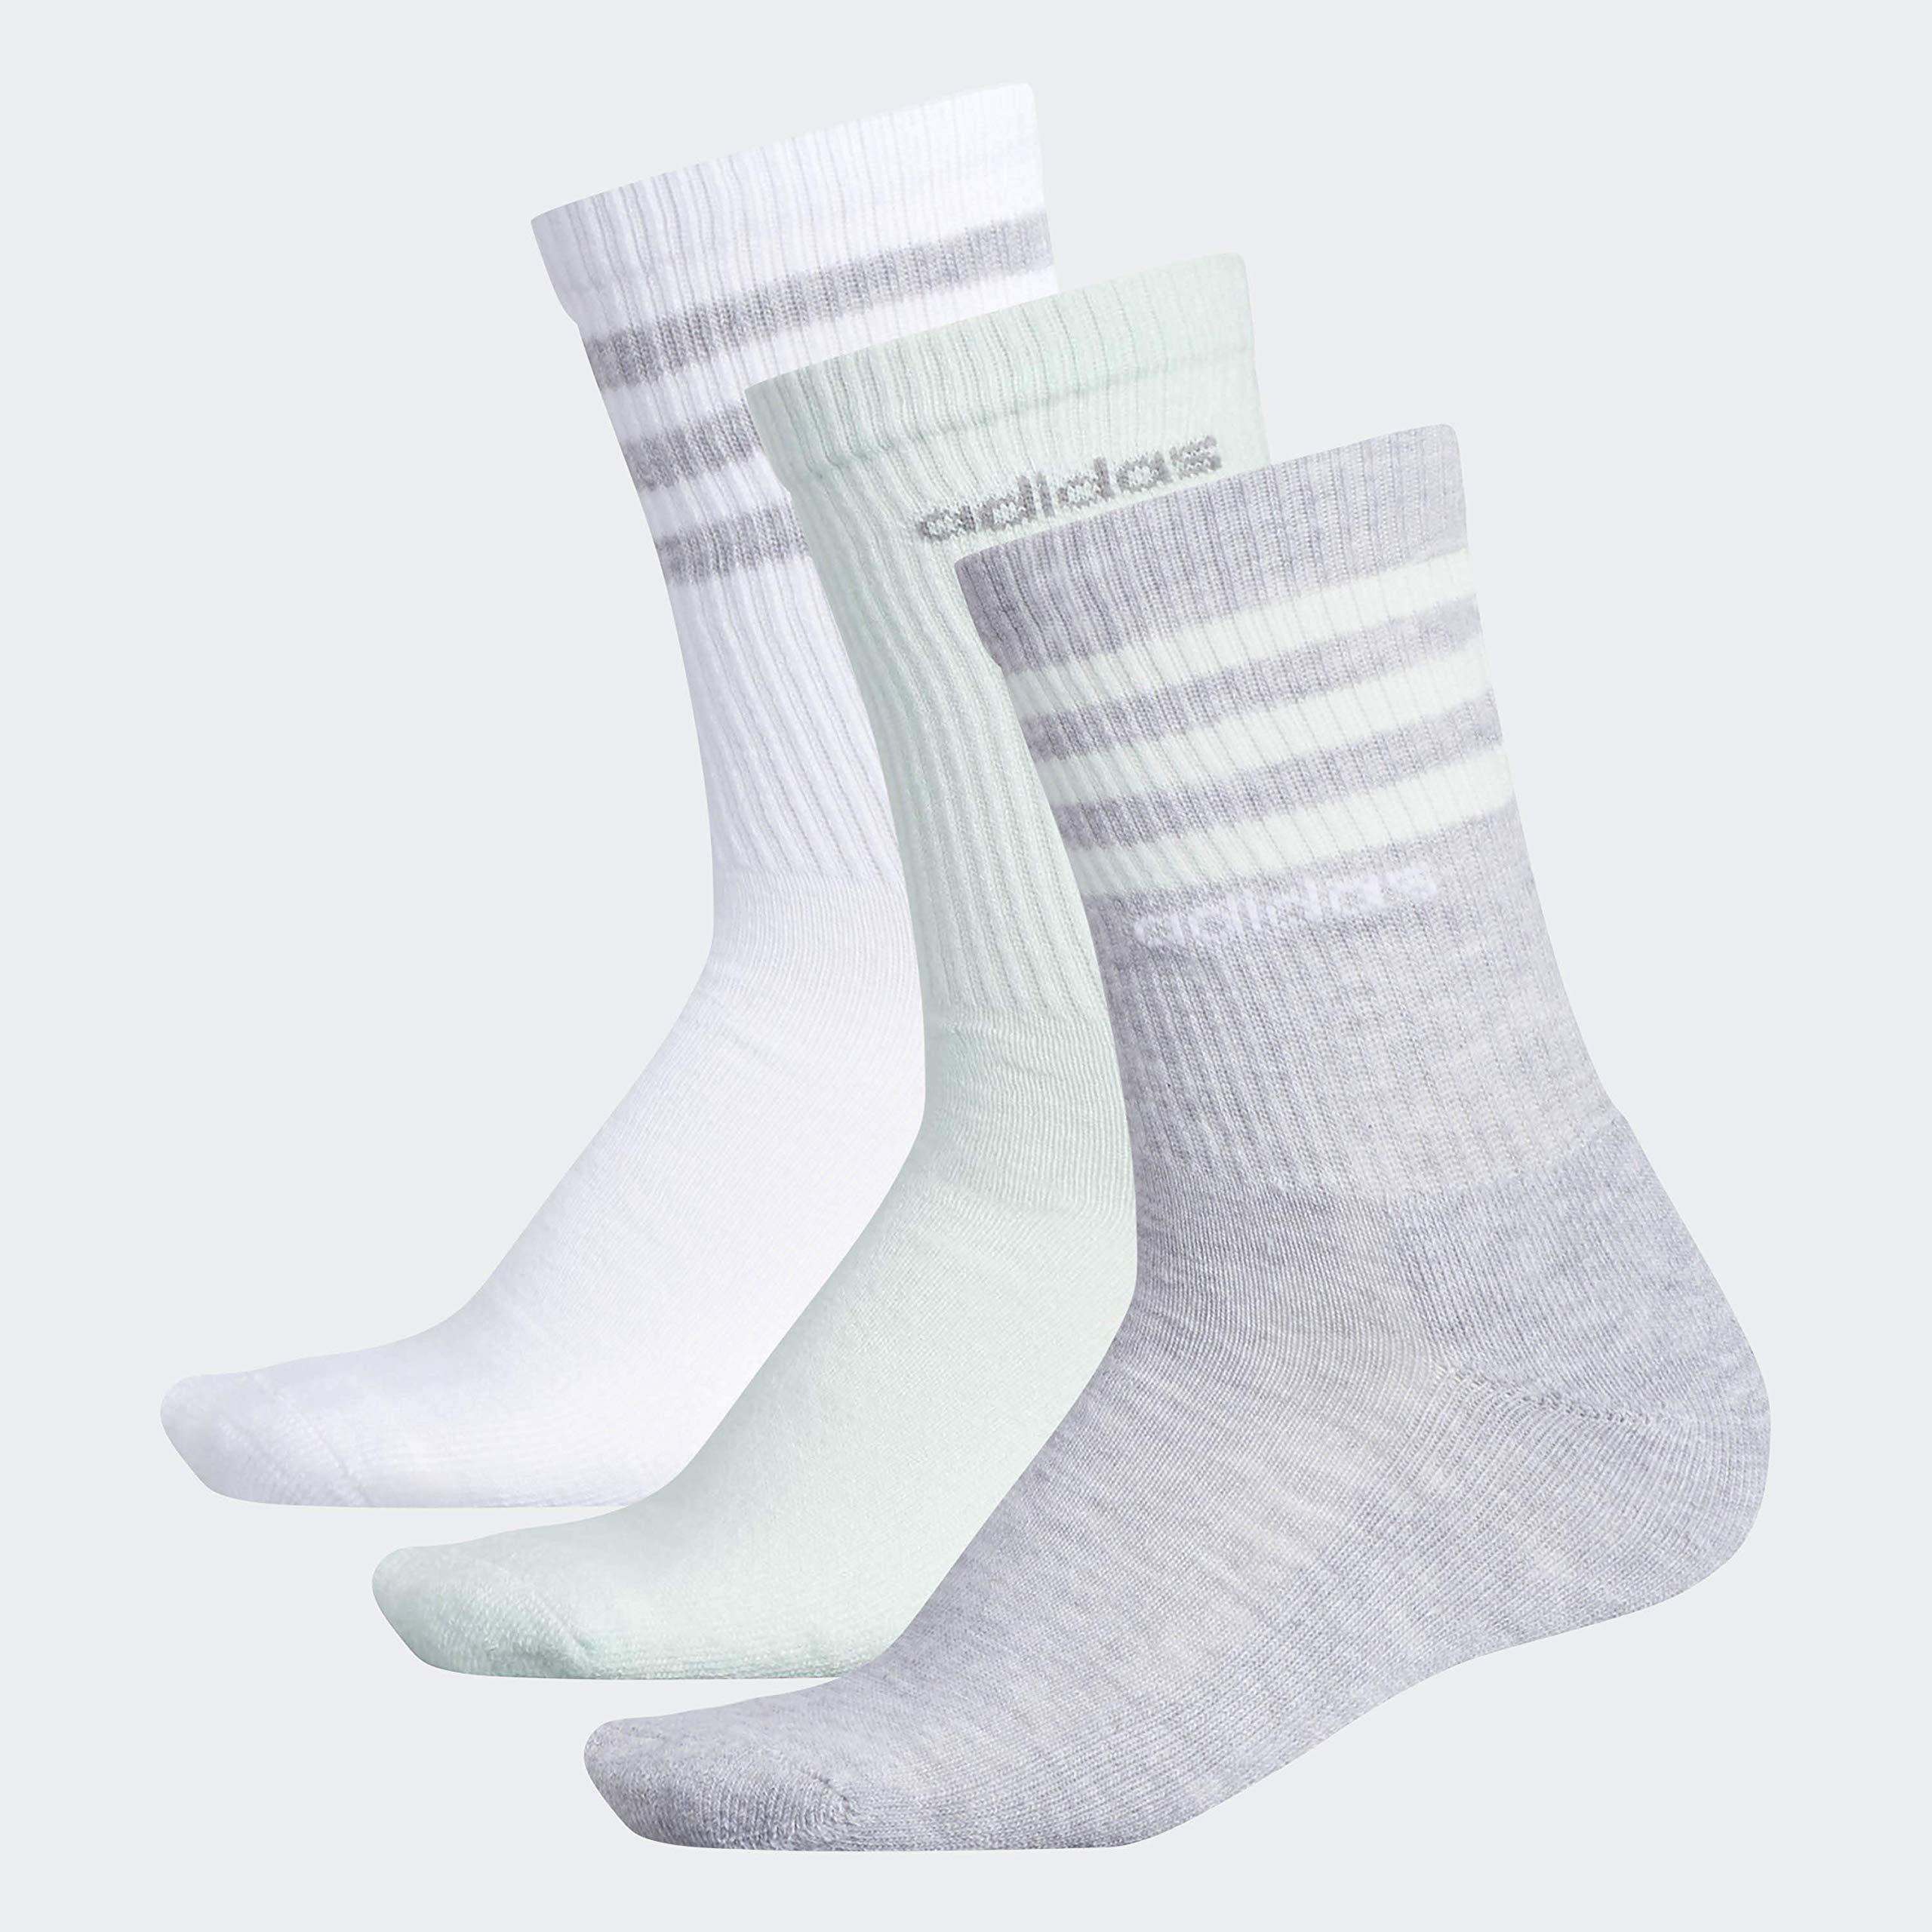 adidas Women's 3-Stripe Crew Socks (3-Pair), Heather Light Grey/Clear Mint/White/Light Onix, Medium, (Shoe Size 5-10) by adidas